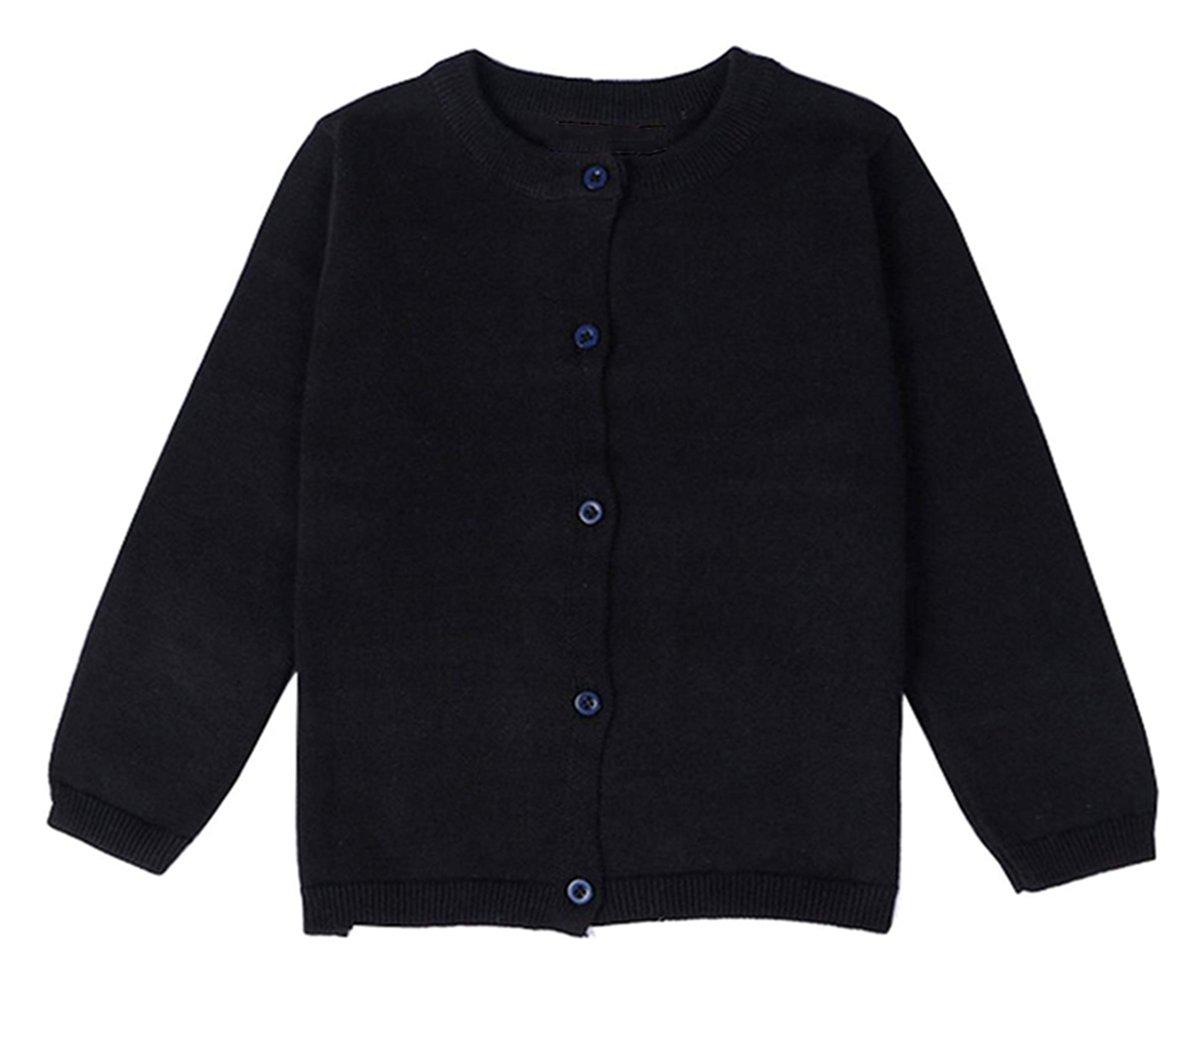 lymanchi Little Girls' Long Sleeve Cardigan Button Crewneck Knit Bowknot Sweater 101 Black 6